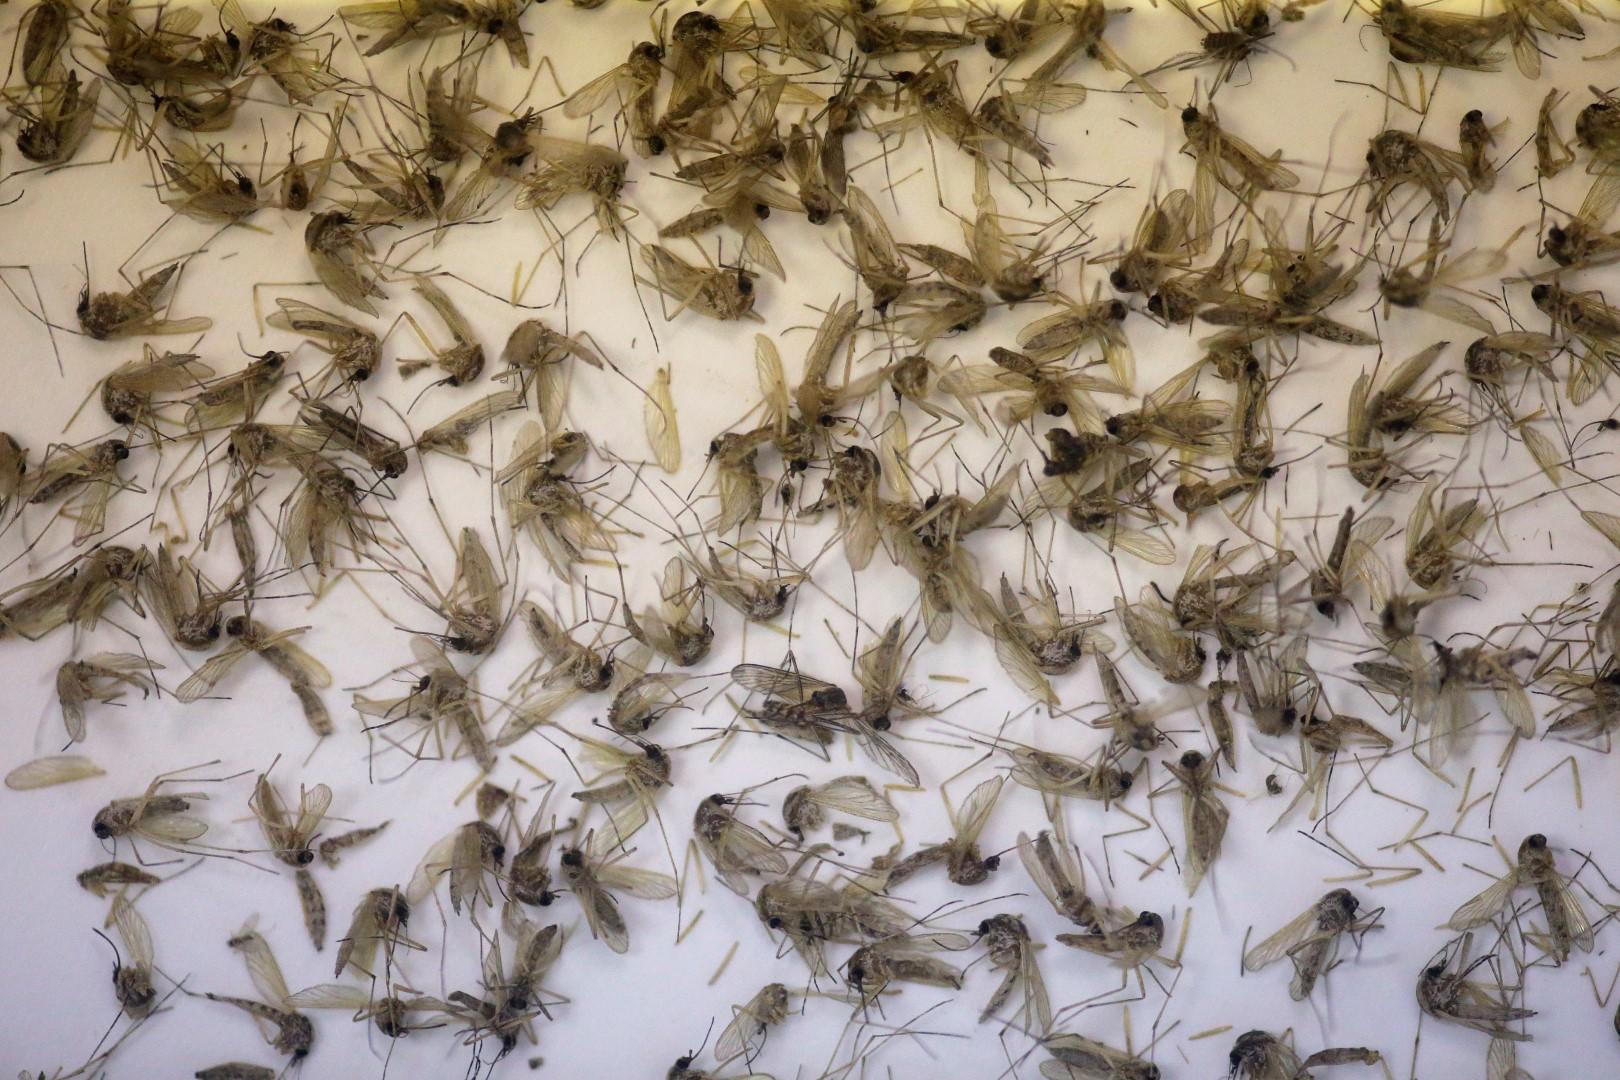 zika-mosquitos-Large.jpg